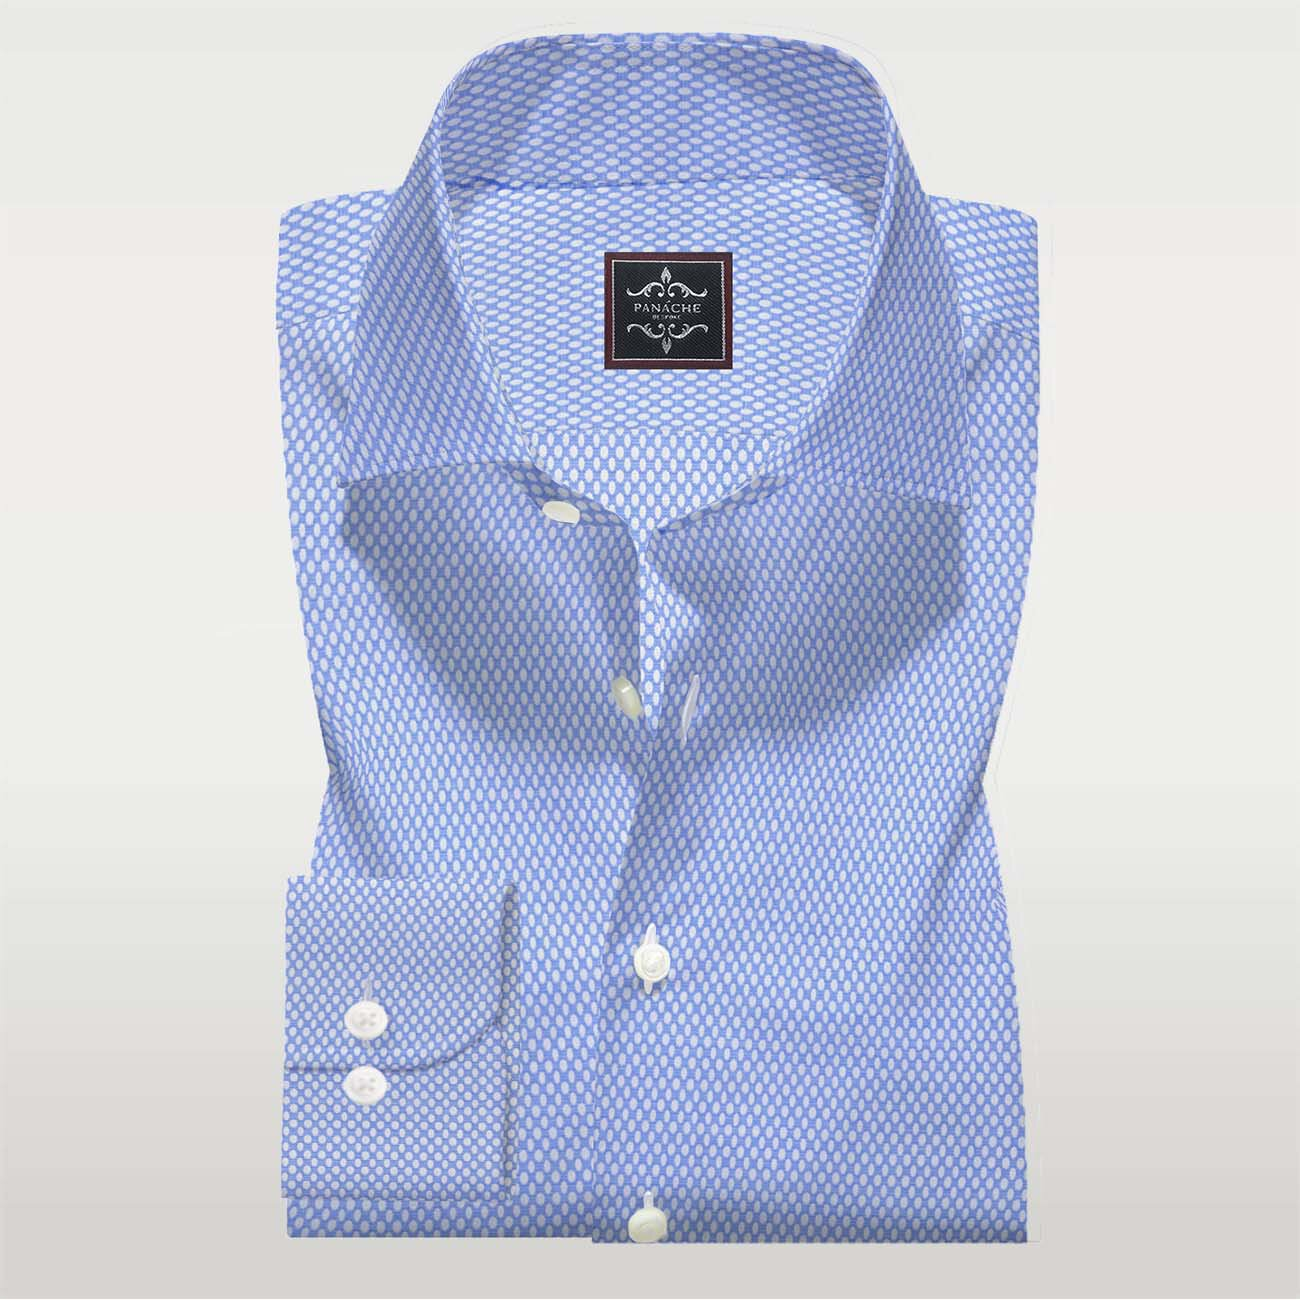 Self Dot Shirt